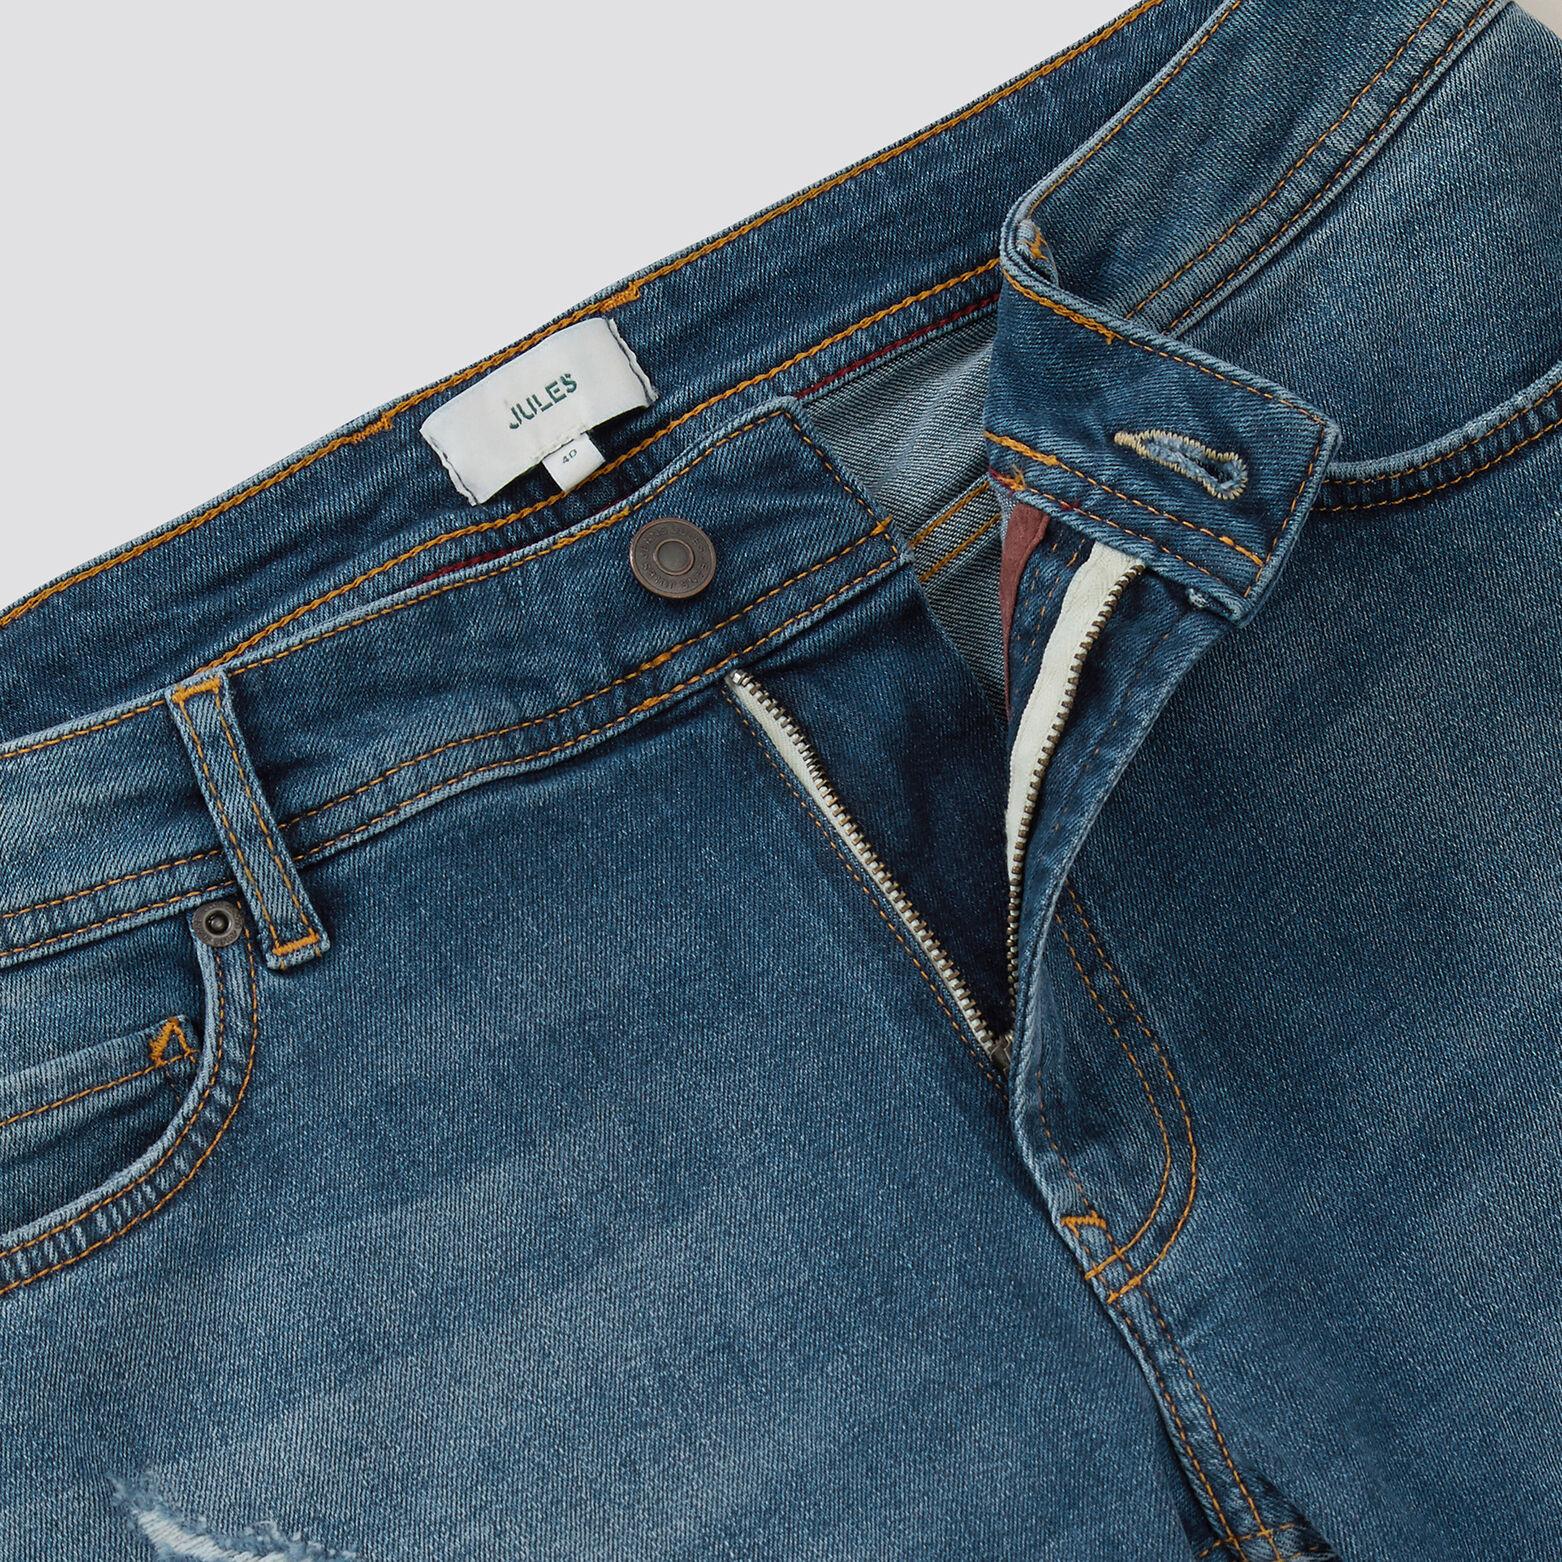 Bermuda 5 poches denim usé